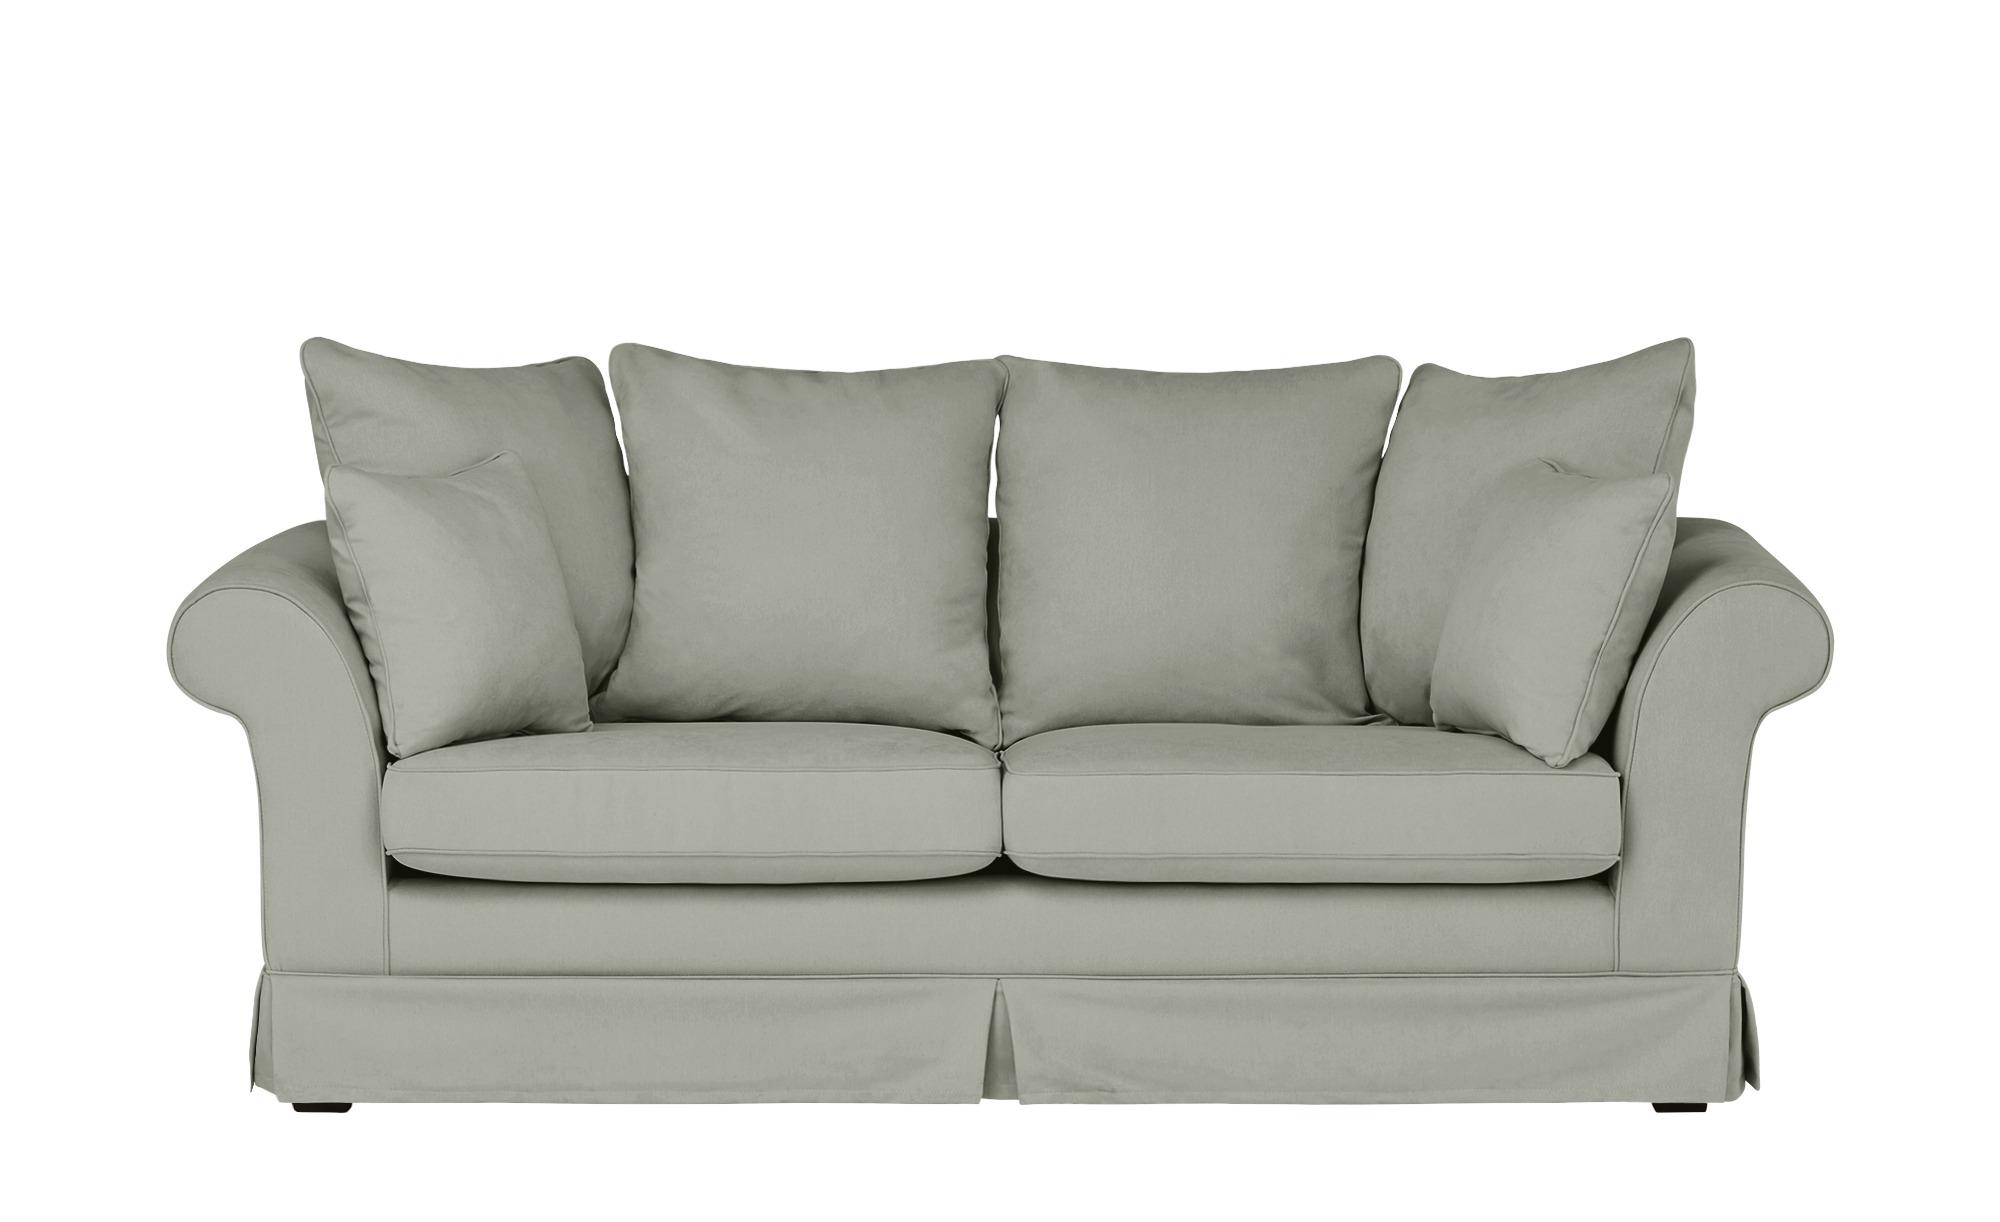 Hussensofa, 3-sitzig  Hampton ¦ grau ¦ Maße (cm): B: 214 H: 70 T: 92 Polstermöbel > Sofas > 3-Sitzer - Höffner